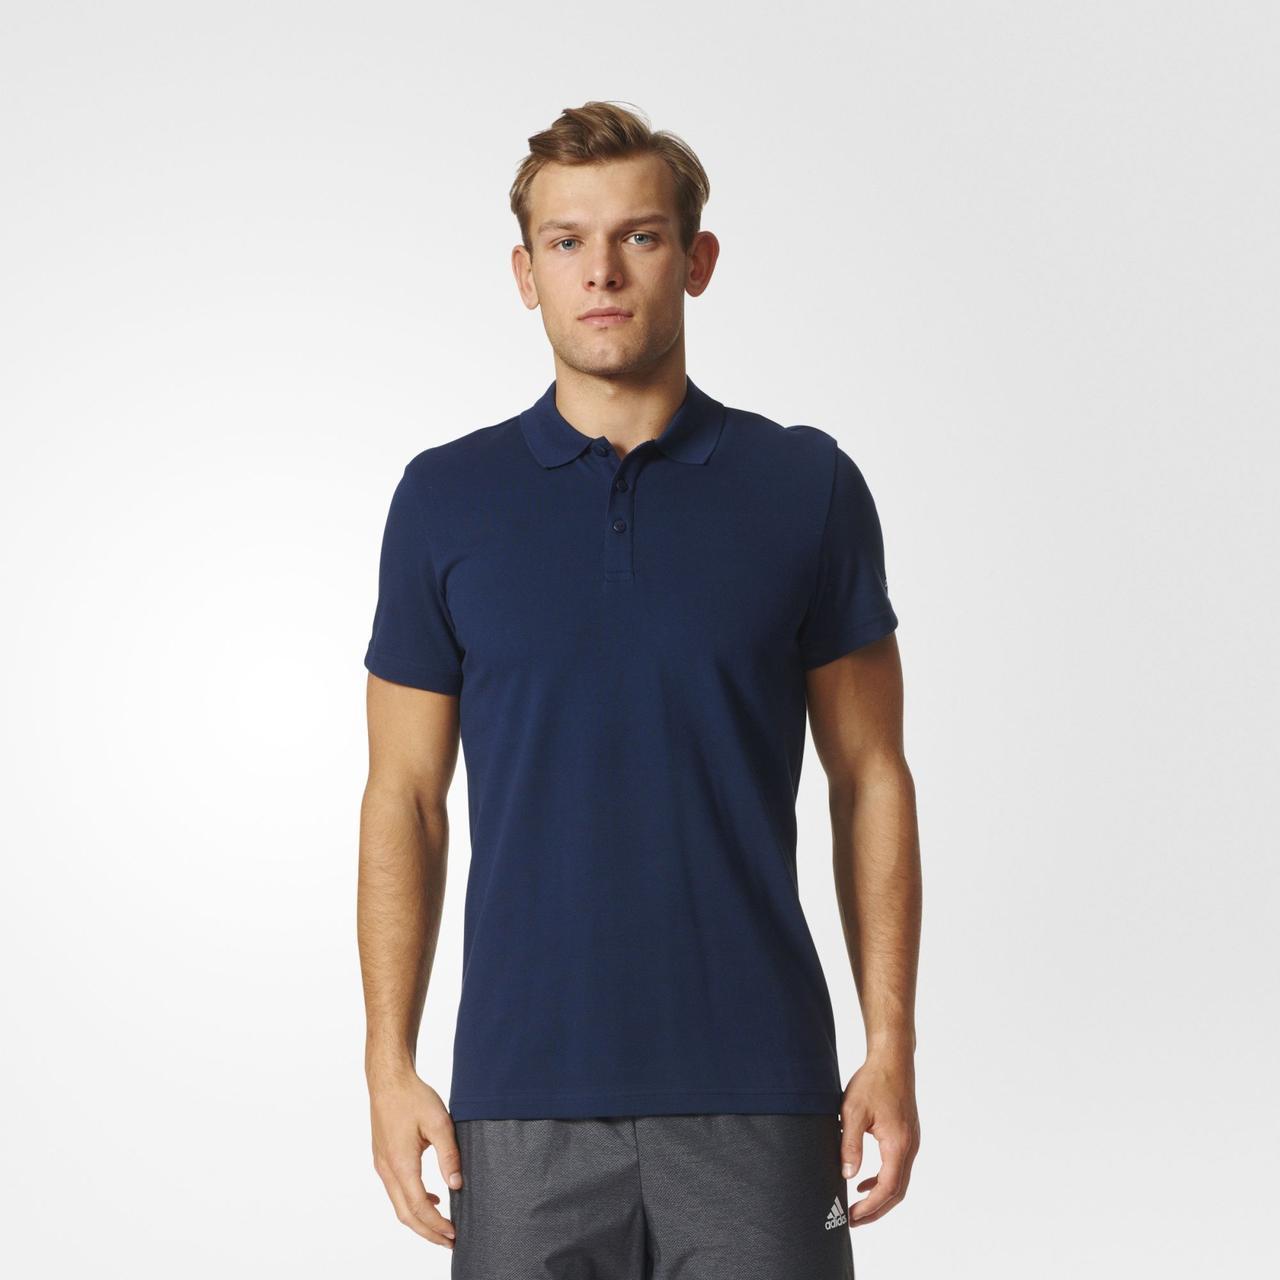 Мужская футболка Adidas Performance Essentials Basic (Артикул: S98755)